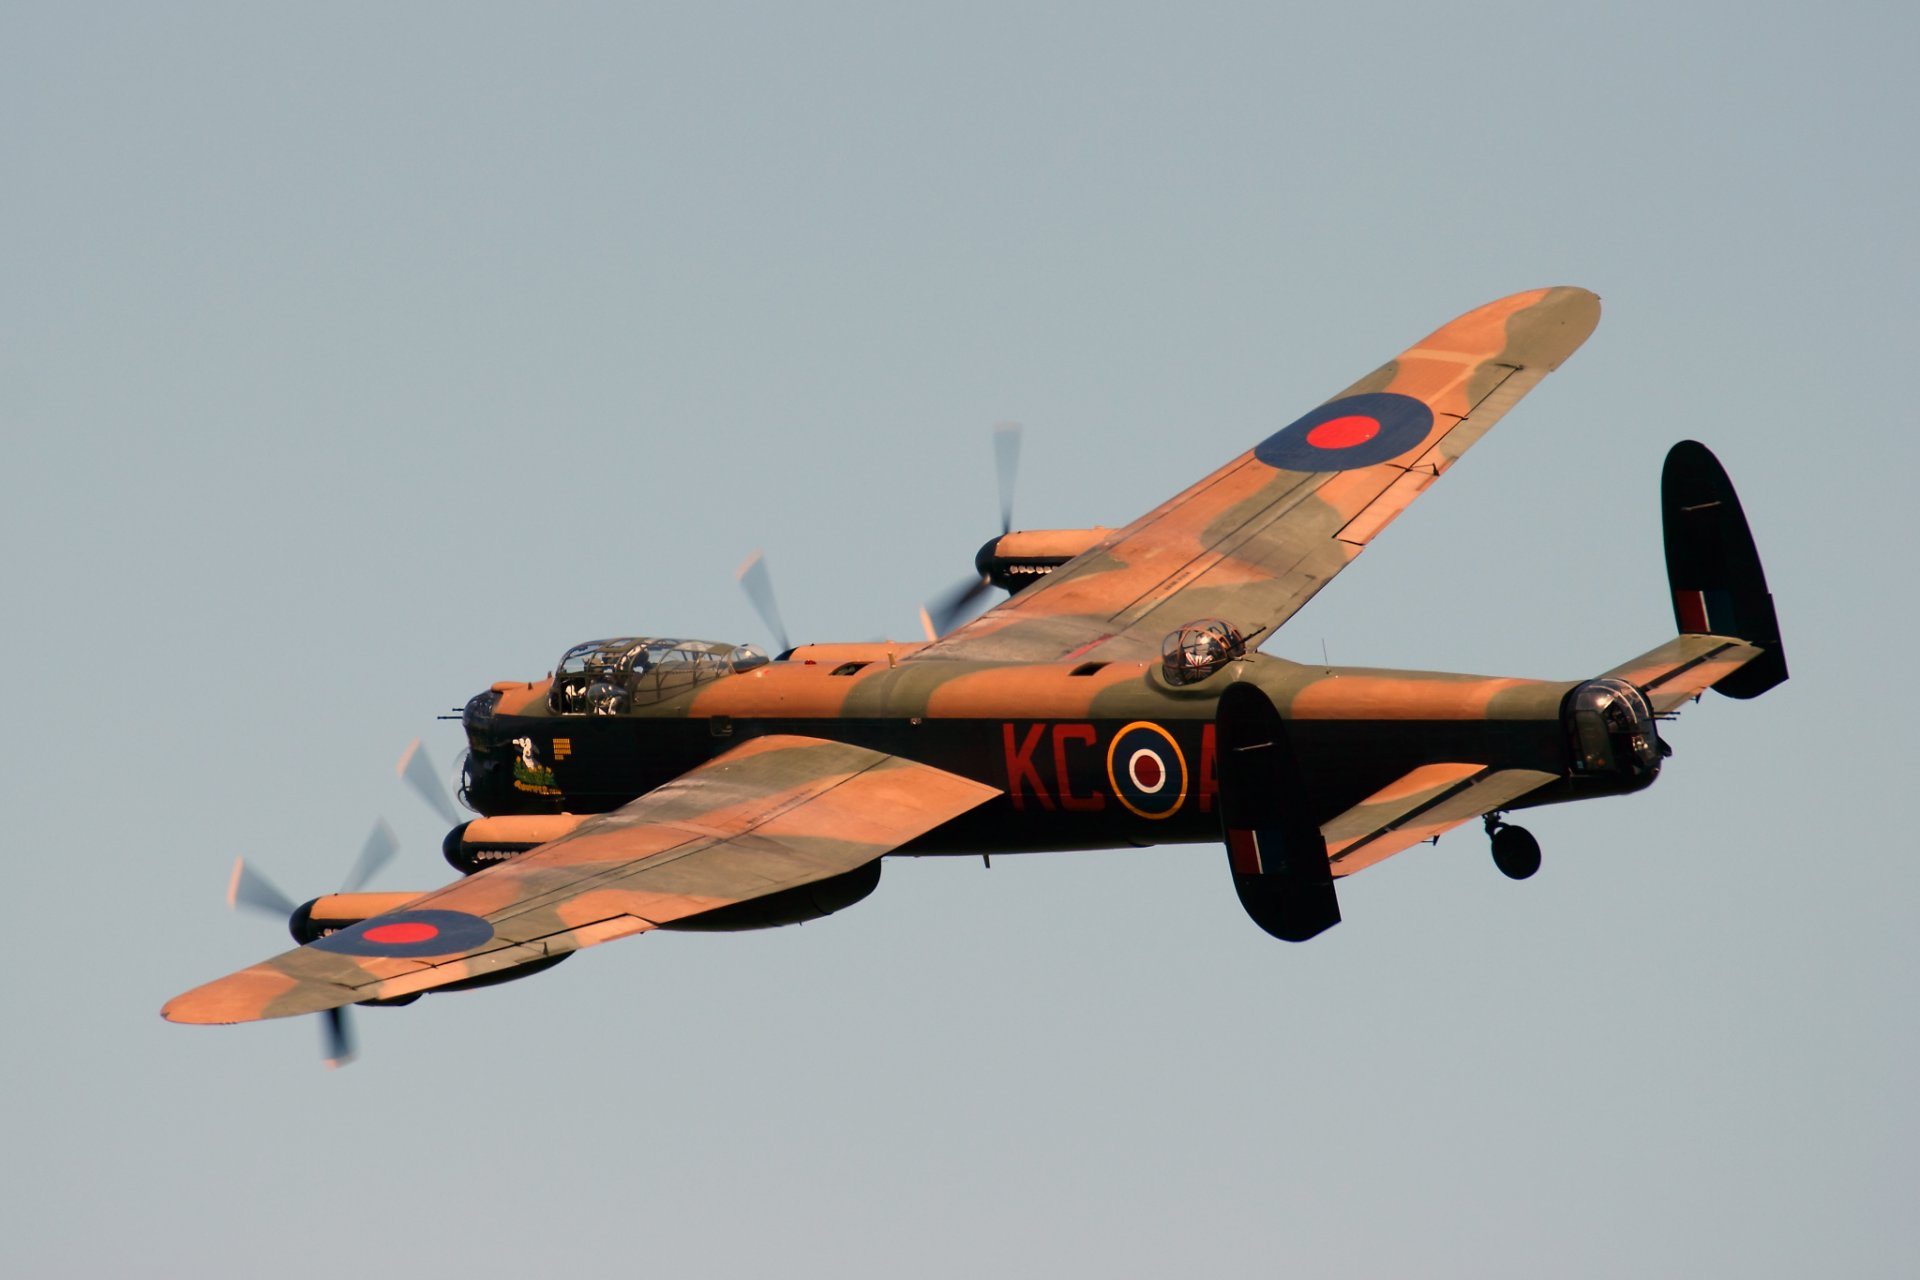 Обои avro lancaster, бомбардировщик, четырёхмоторный. Авиация foto 13